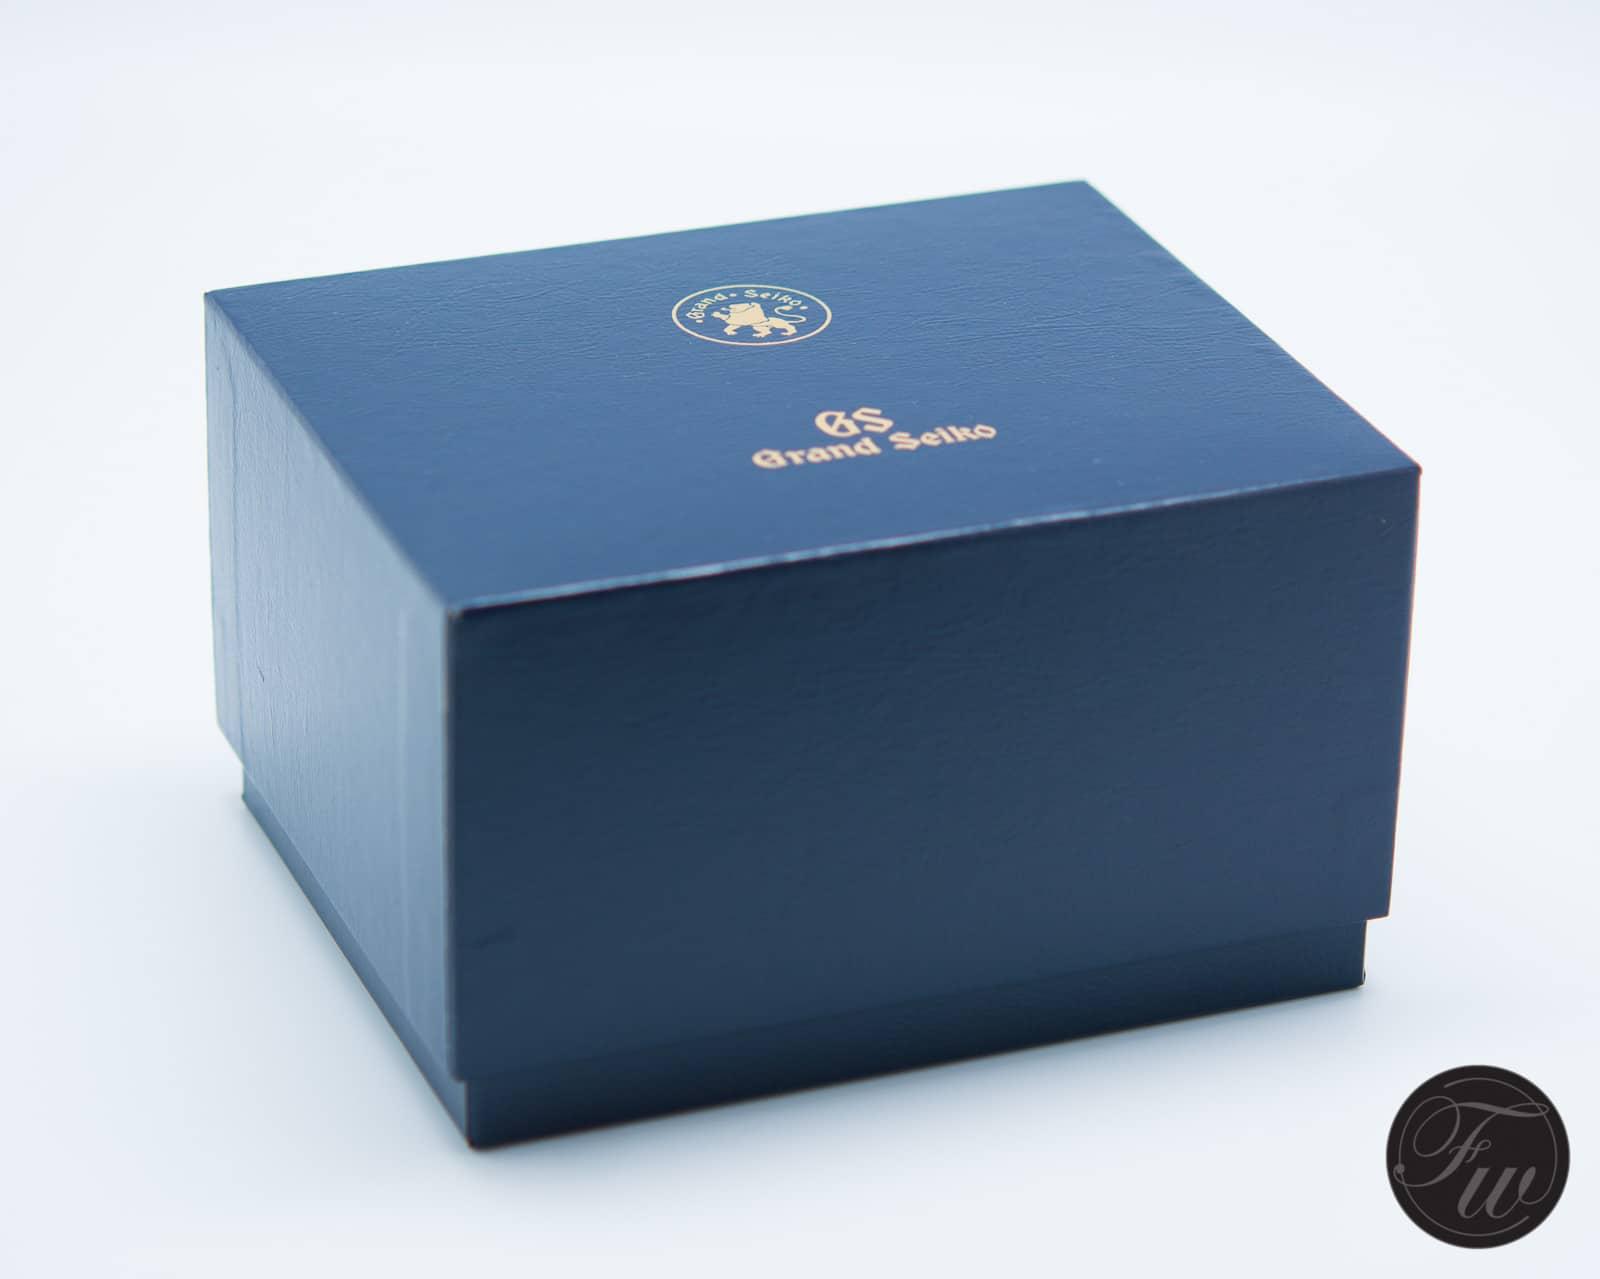 Grand Seiko SBGM021 box